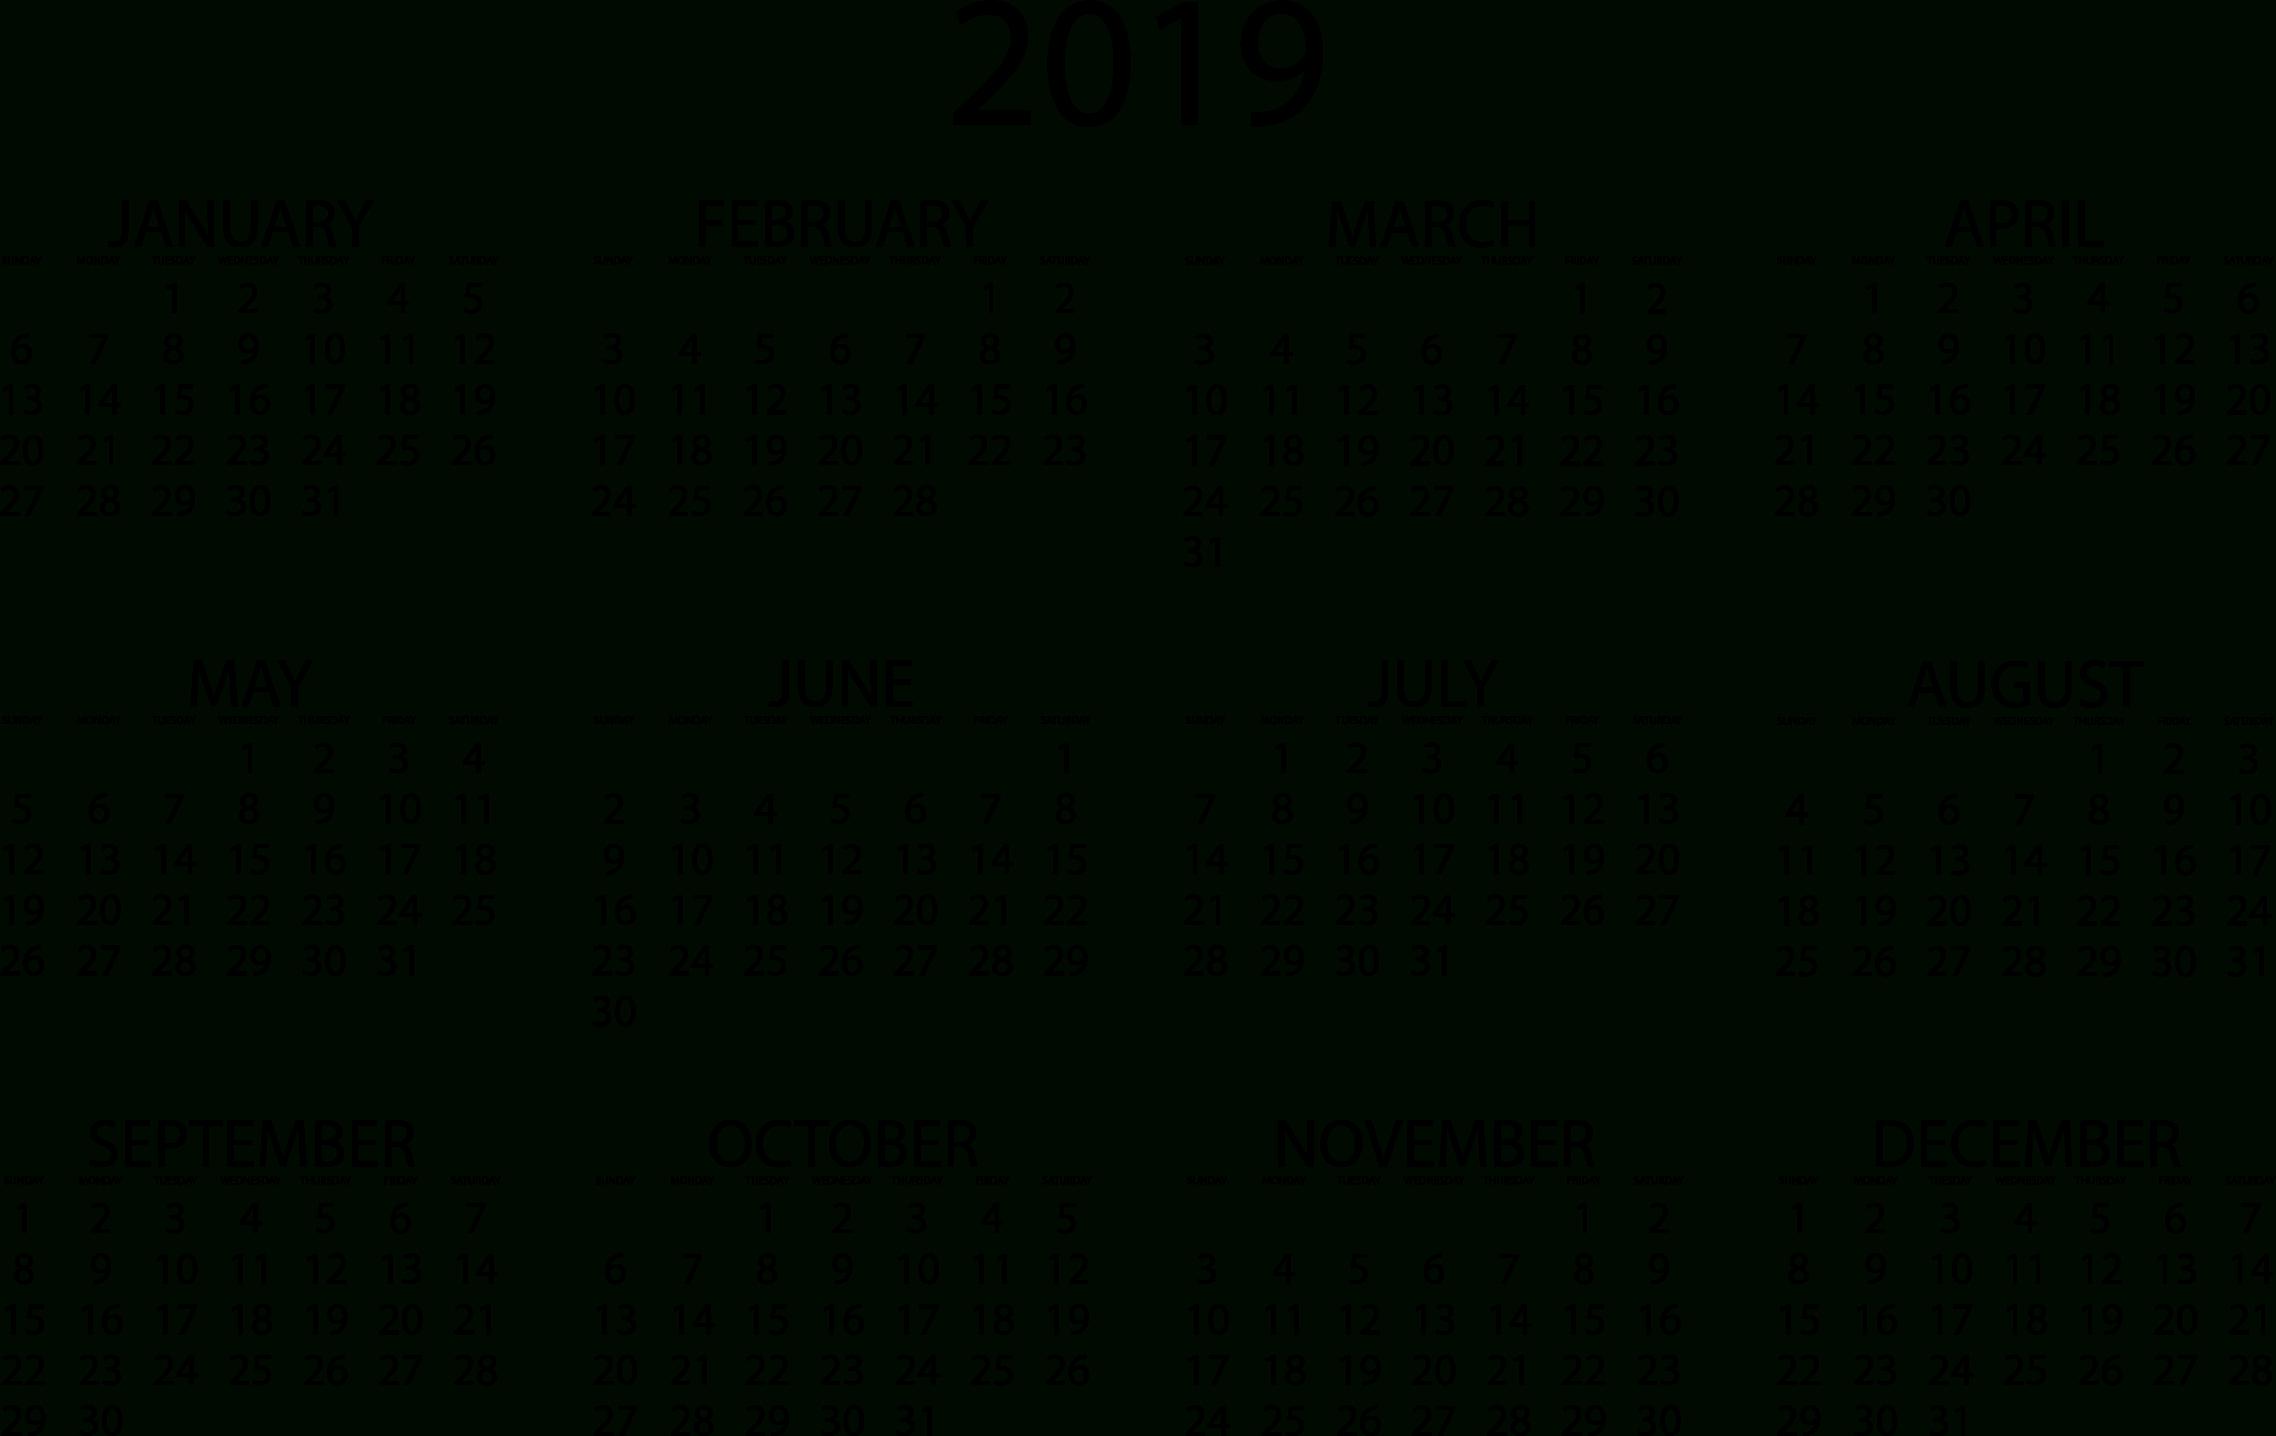 2019 Calendars – Download Printable Pdf Calendar Templates Calendar 2019 Template Pdf